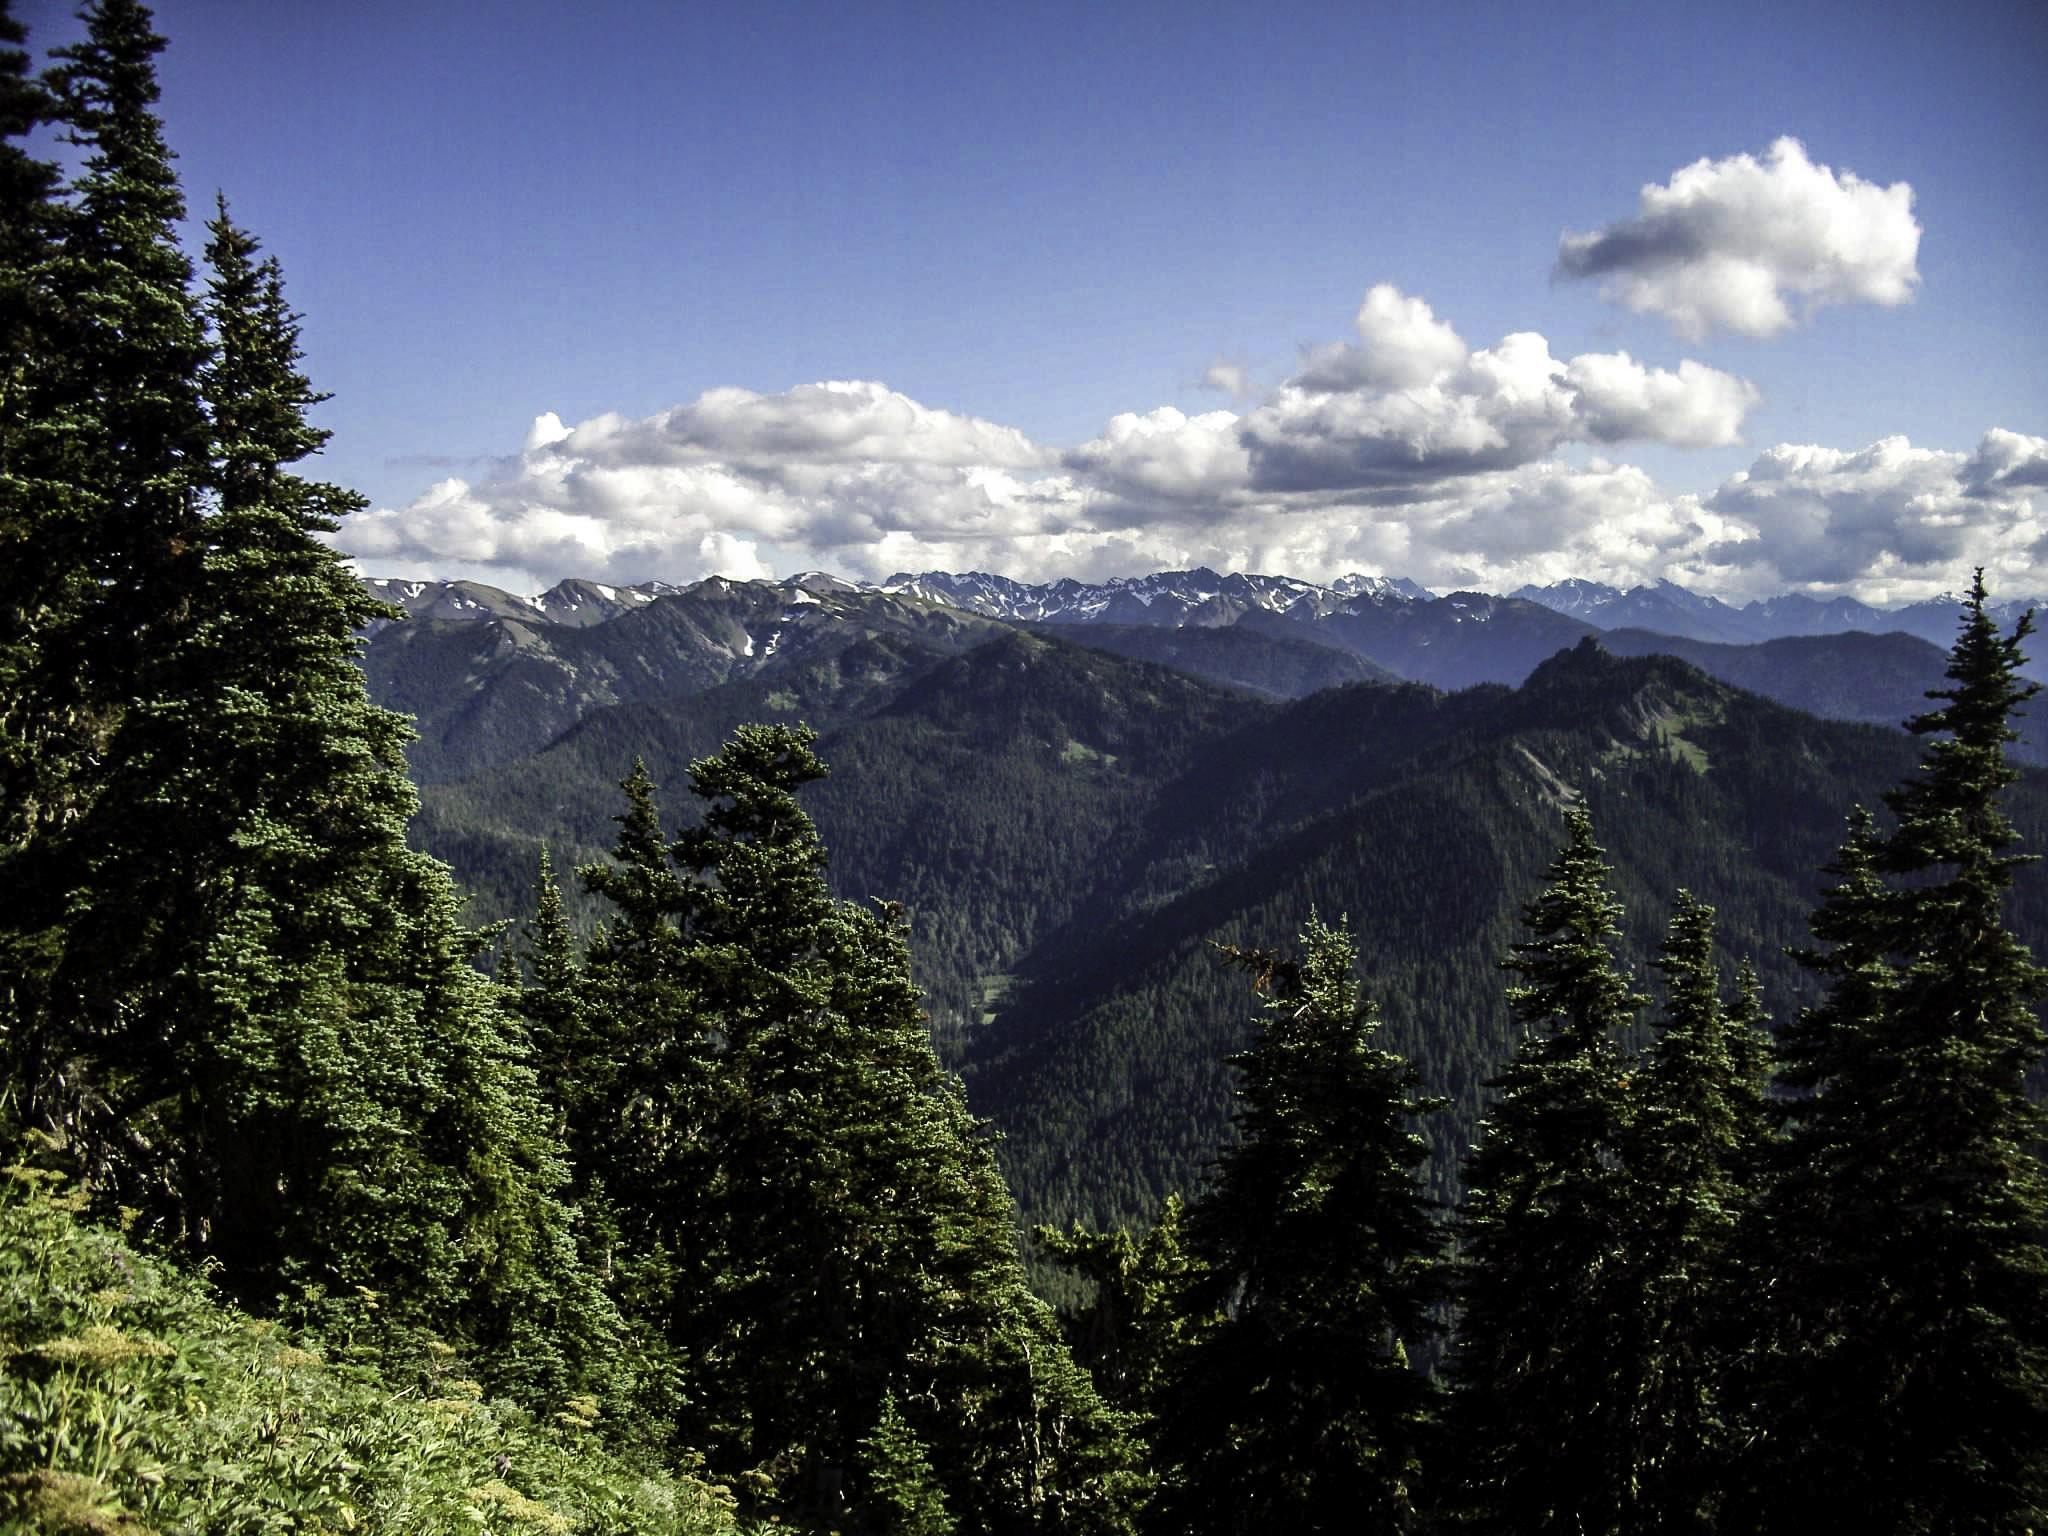 Switchback Trail at Olympic National Park, Washington.